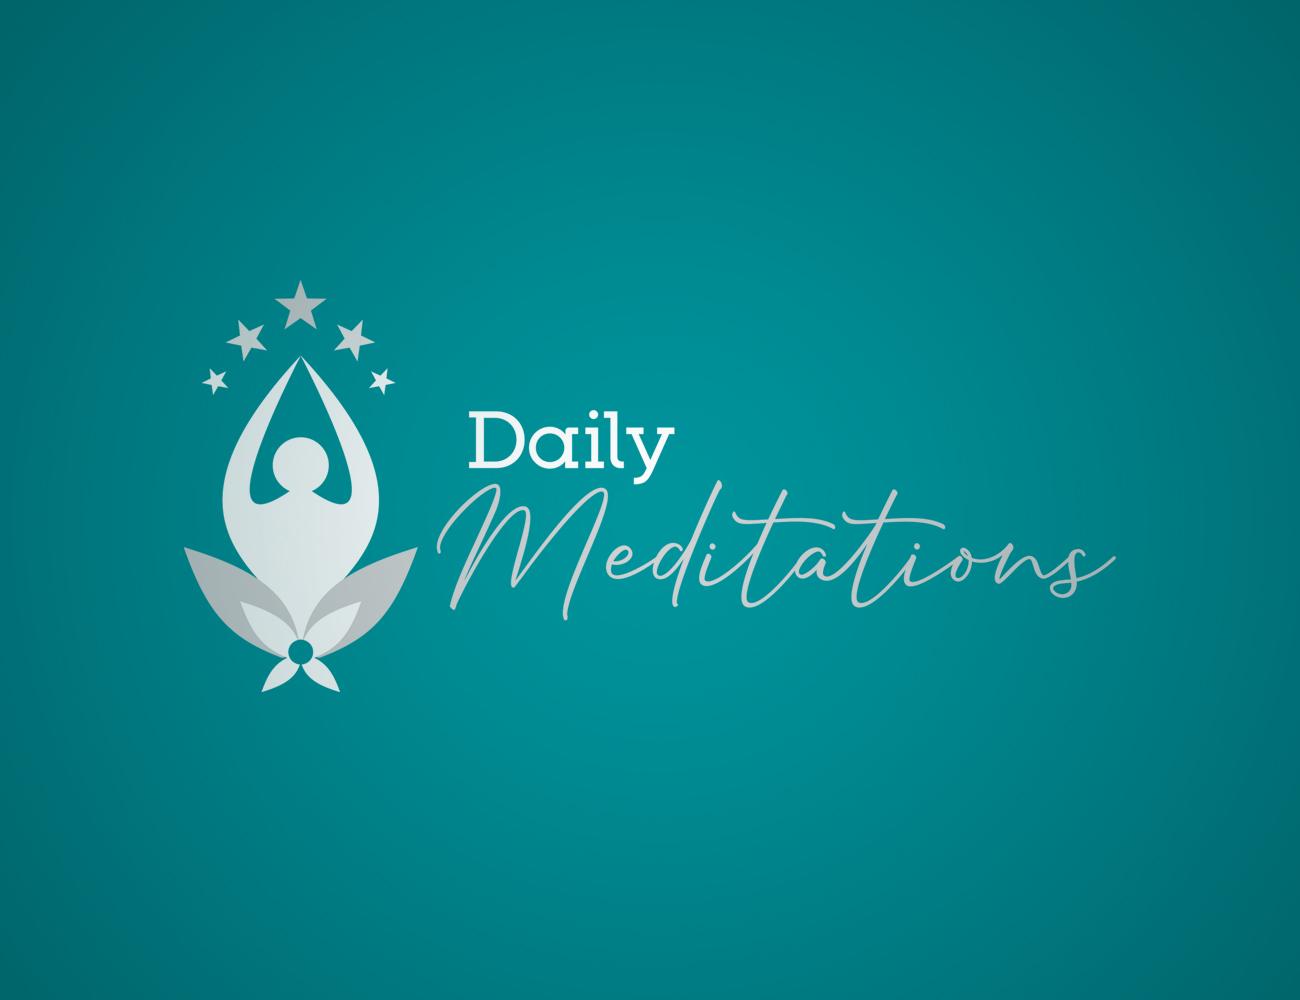 Daily Meditations logo design